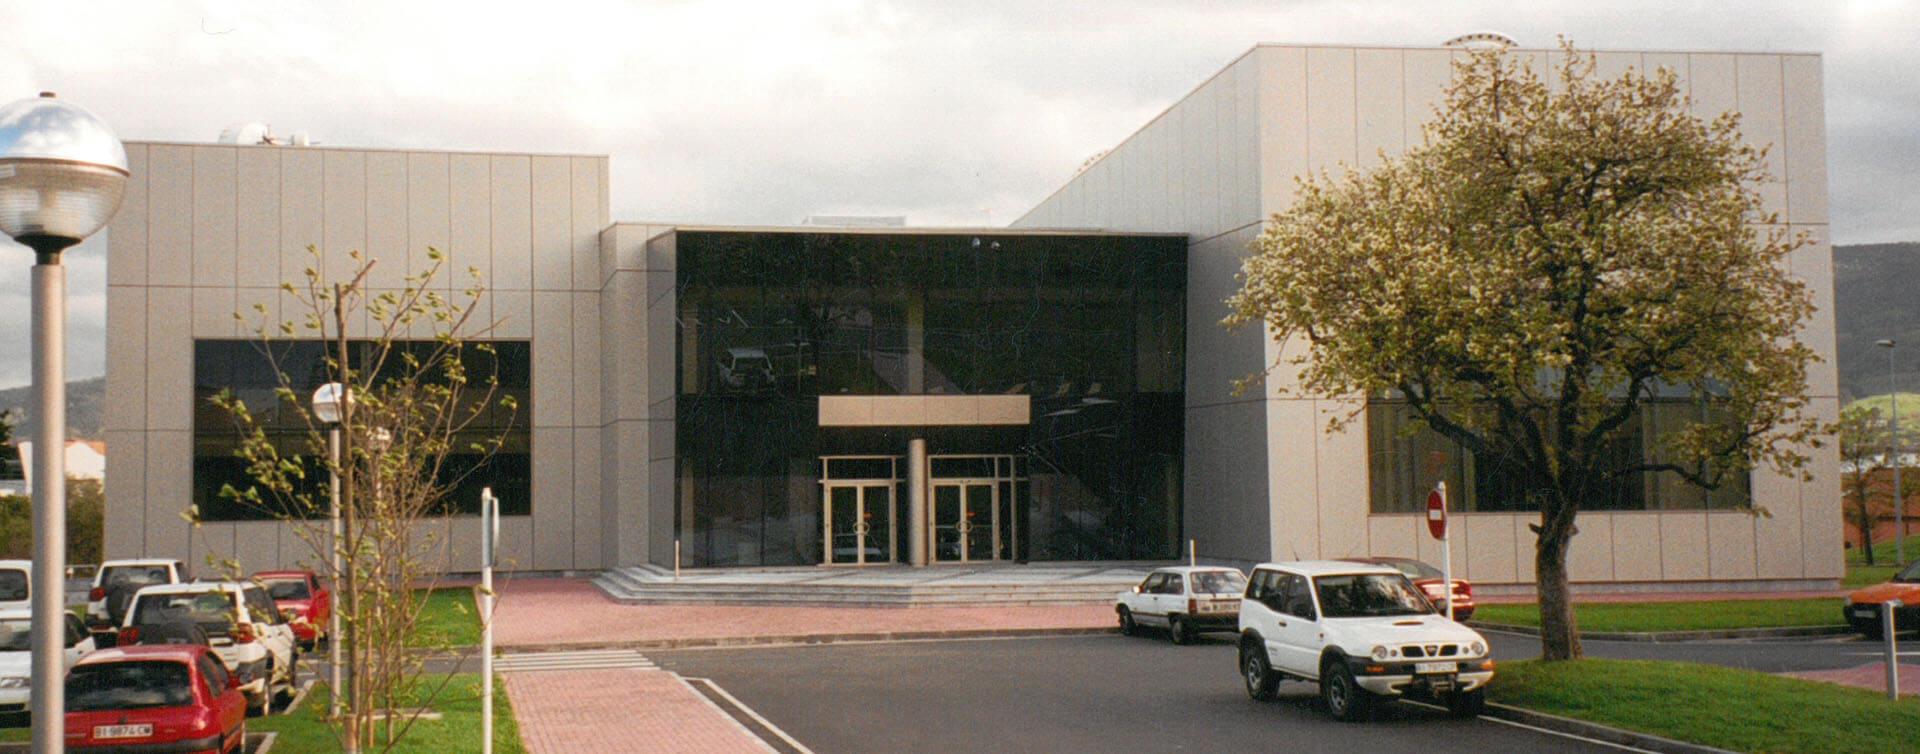 Centro de gestion de redes euskaltel